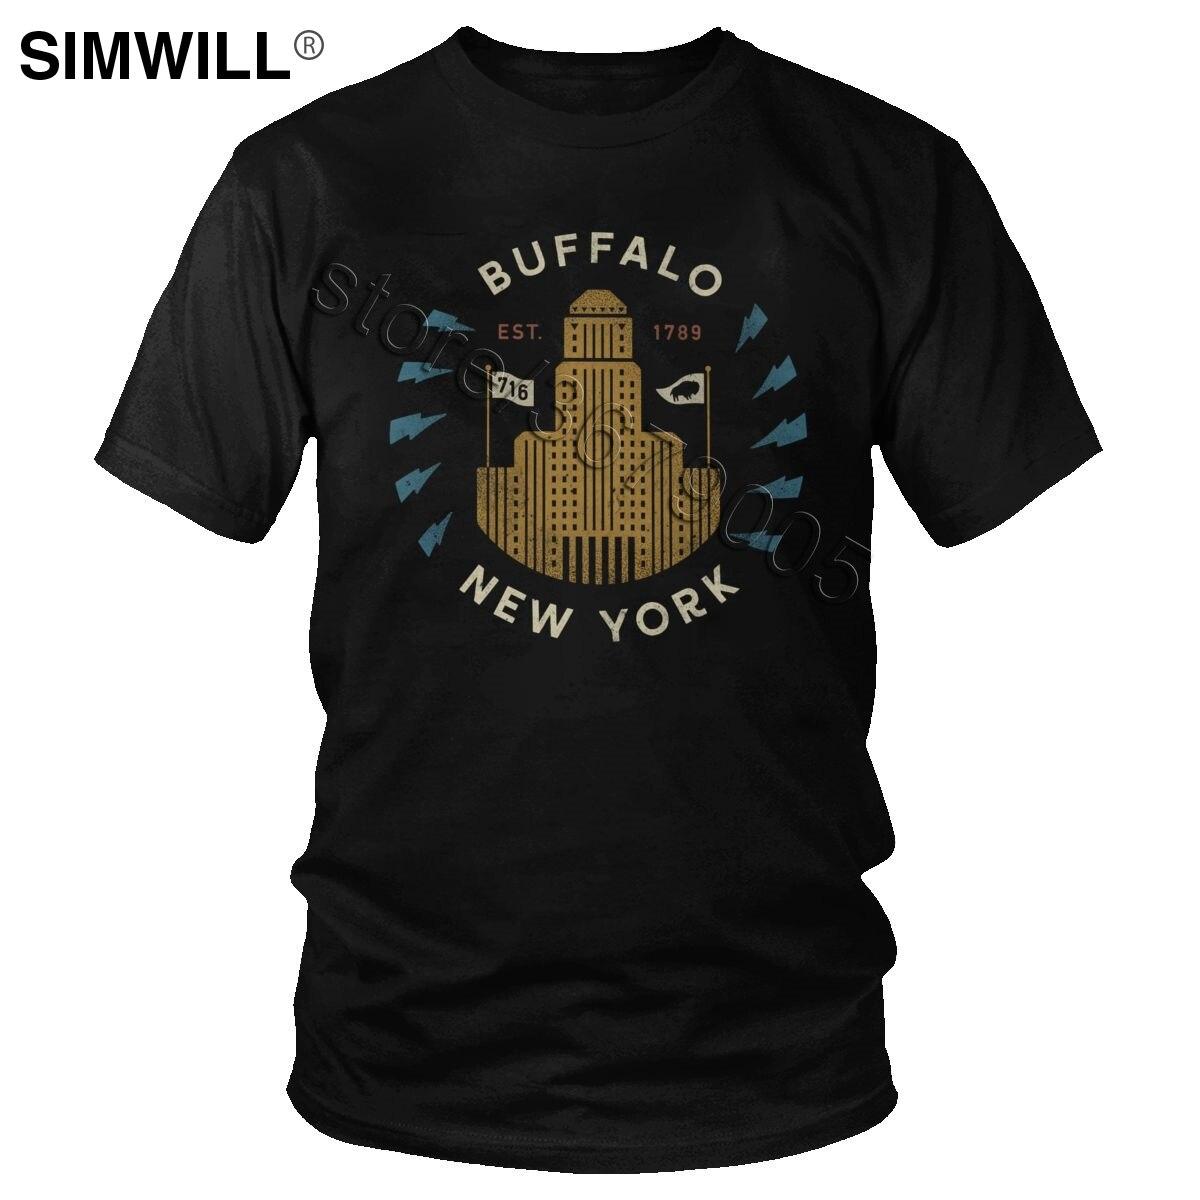 Vintage New York Buffalo camiseta hombres 100% algodón edificio Camisetas manga corta urbana moda Streetwear camiseta regalo Tops